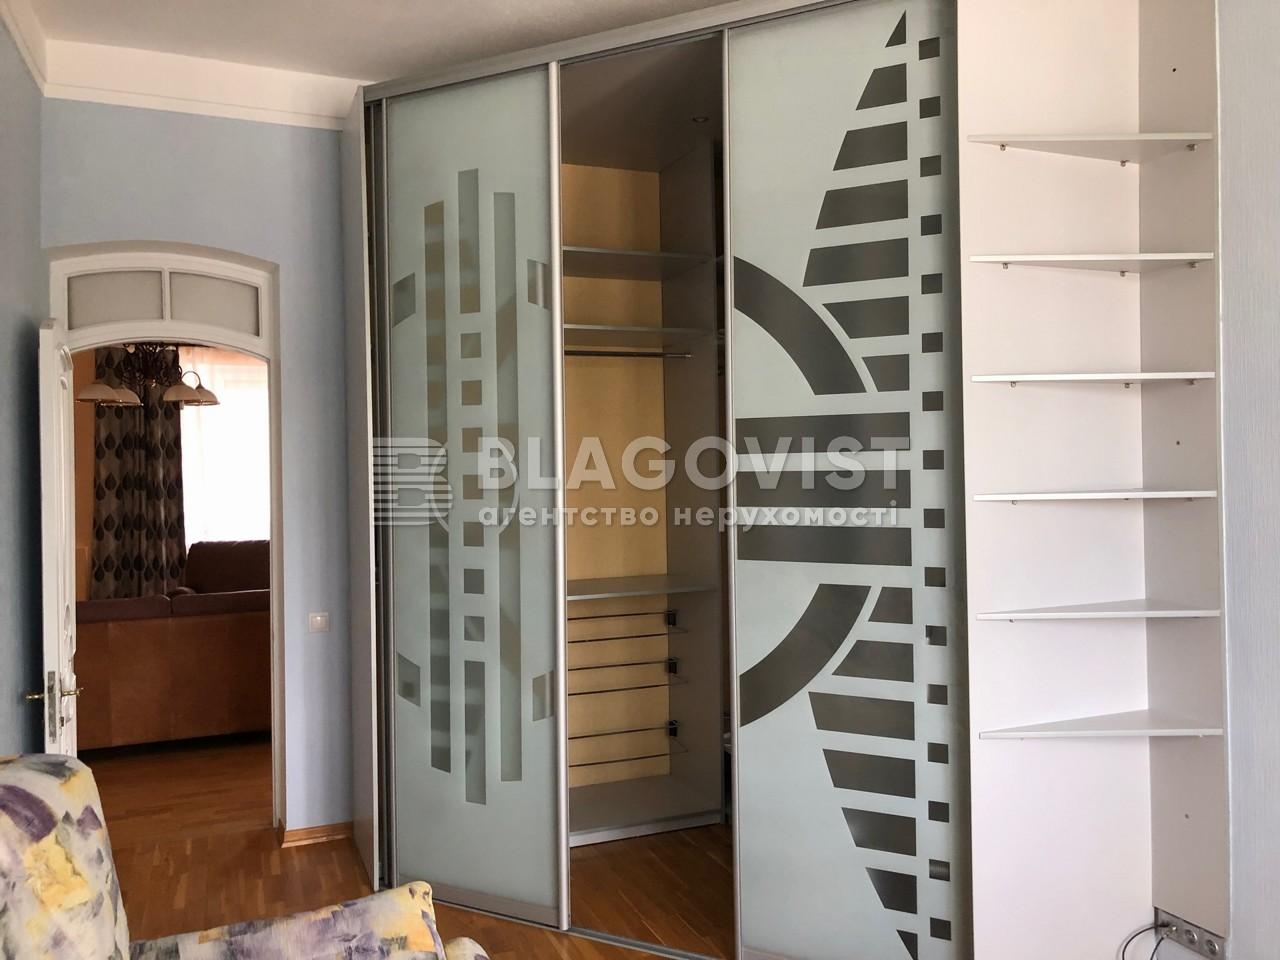 Квартира E-11738, Антоновича (Горького), 4/6, Киев - Фото 11